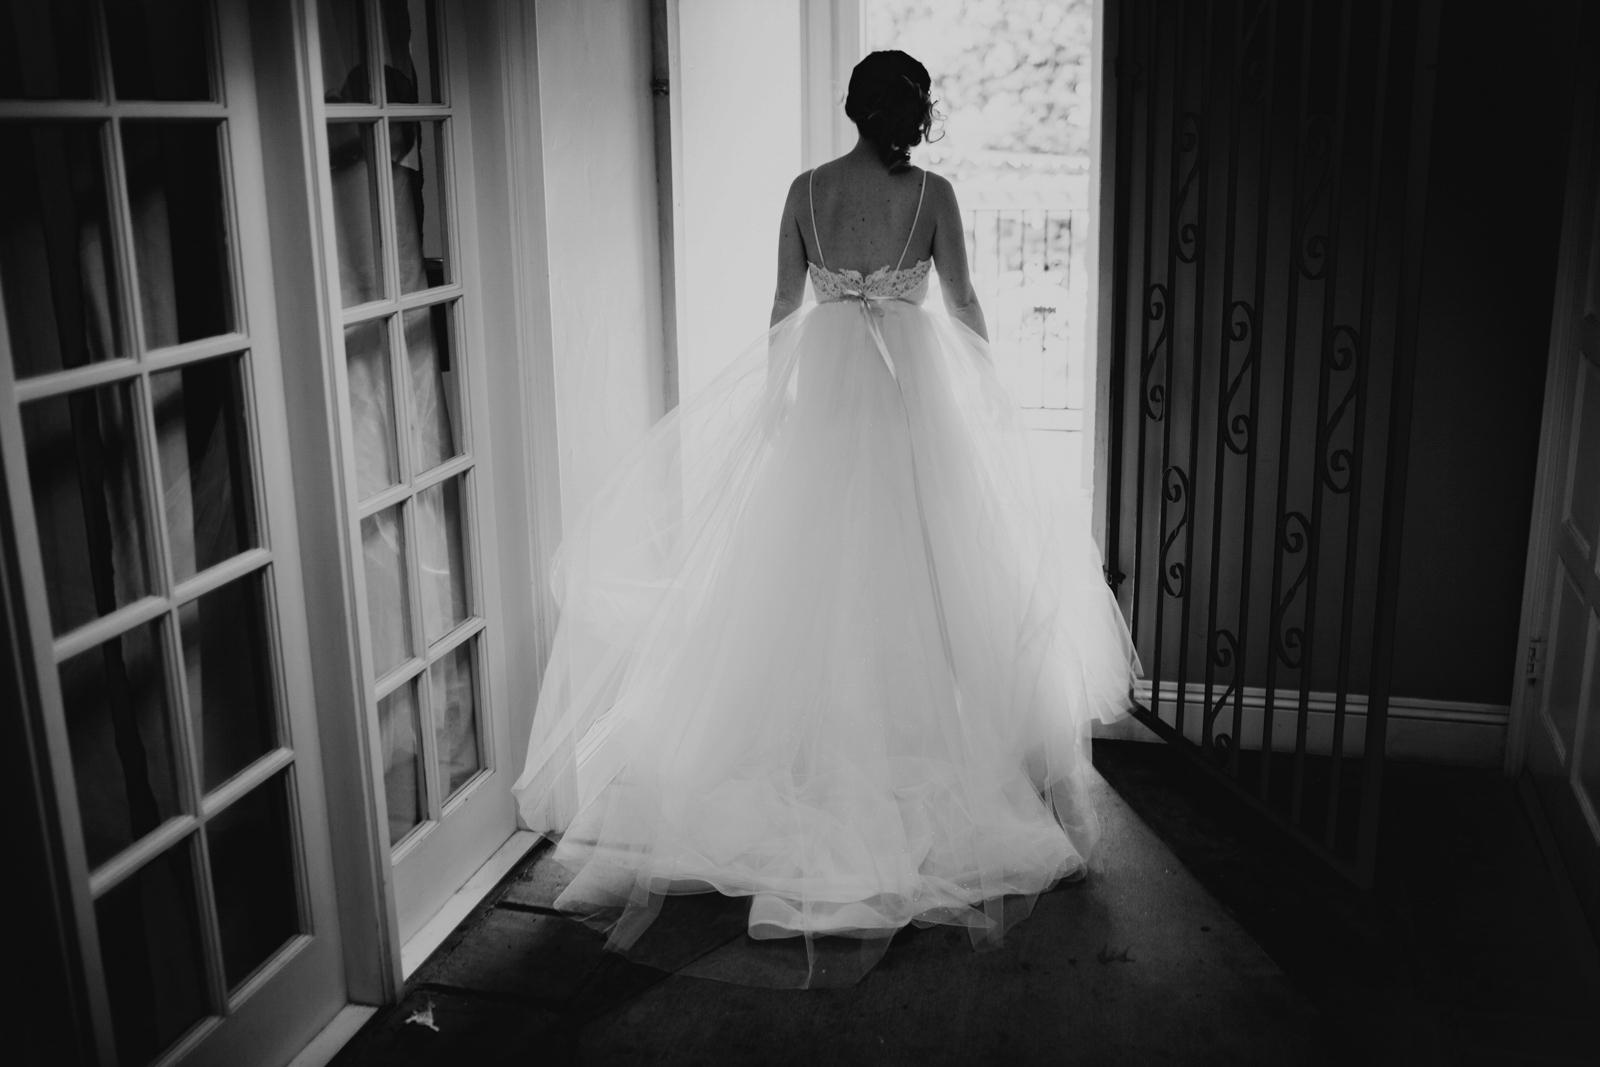 PaulSimonPhotography-JessicaJosh-SanJuanCapistranoWedding-12.jpg